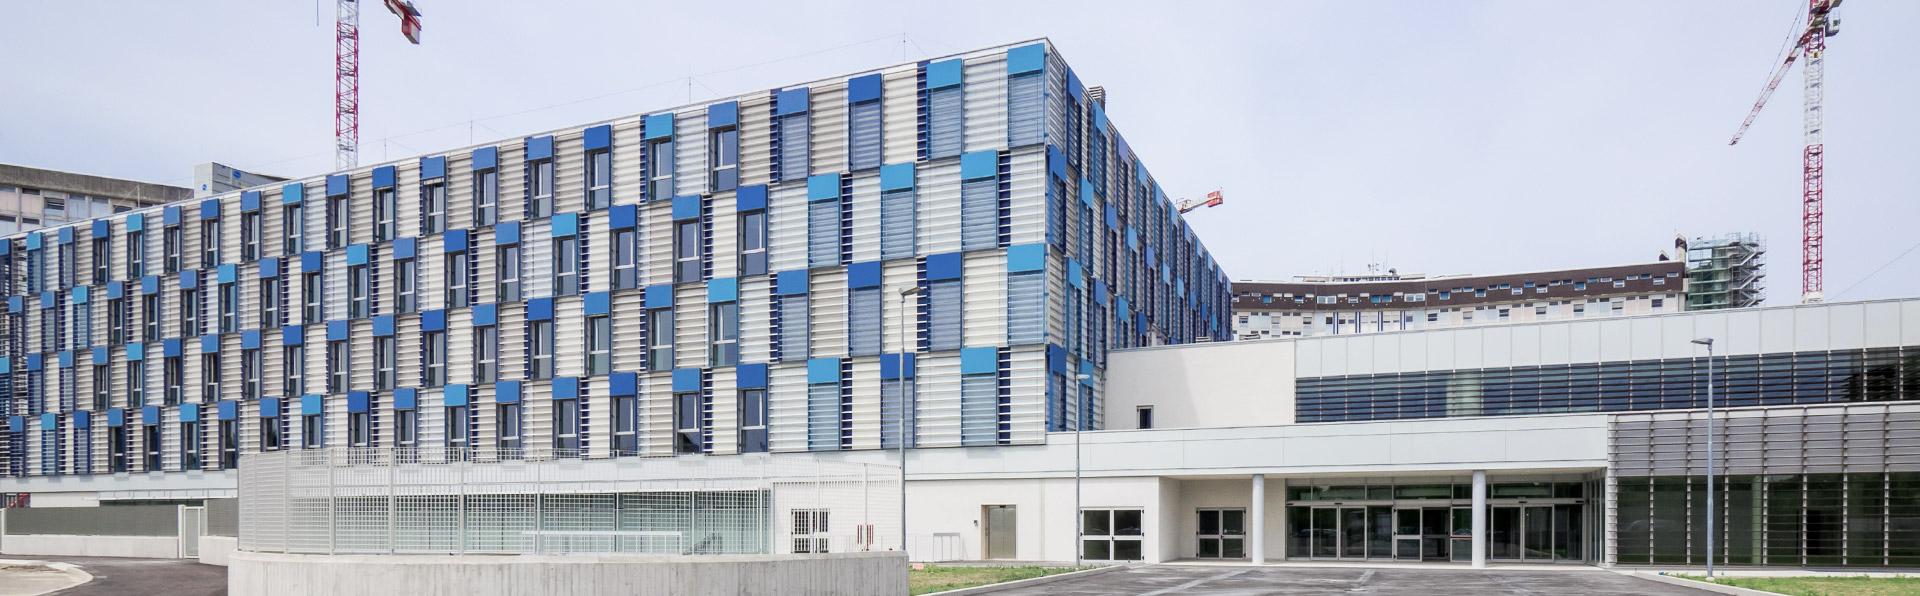 cmb-hospitals-ospedali-san-gerardo-monza-italy